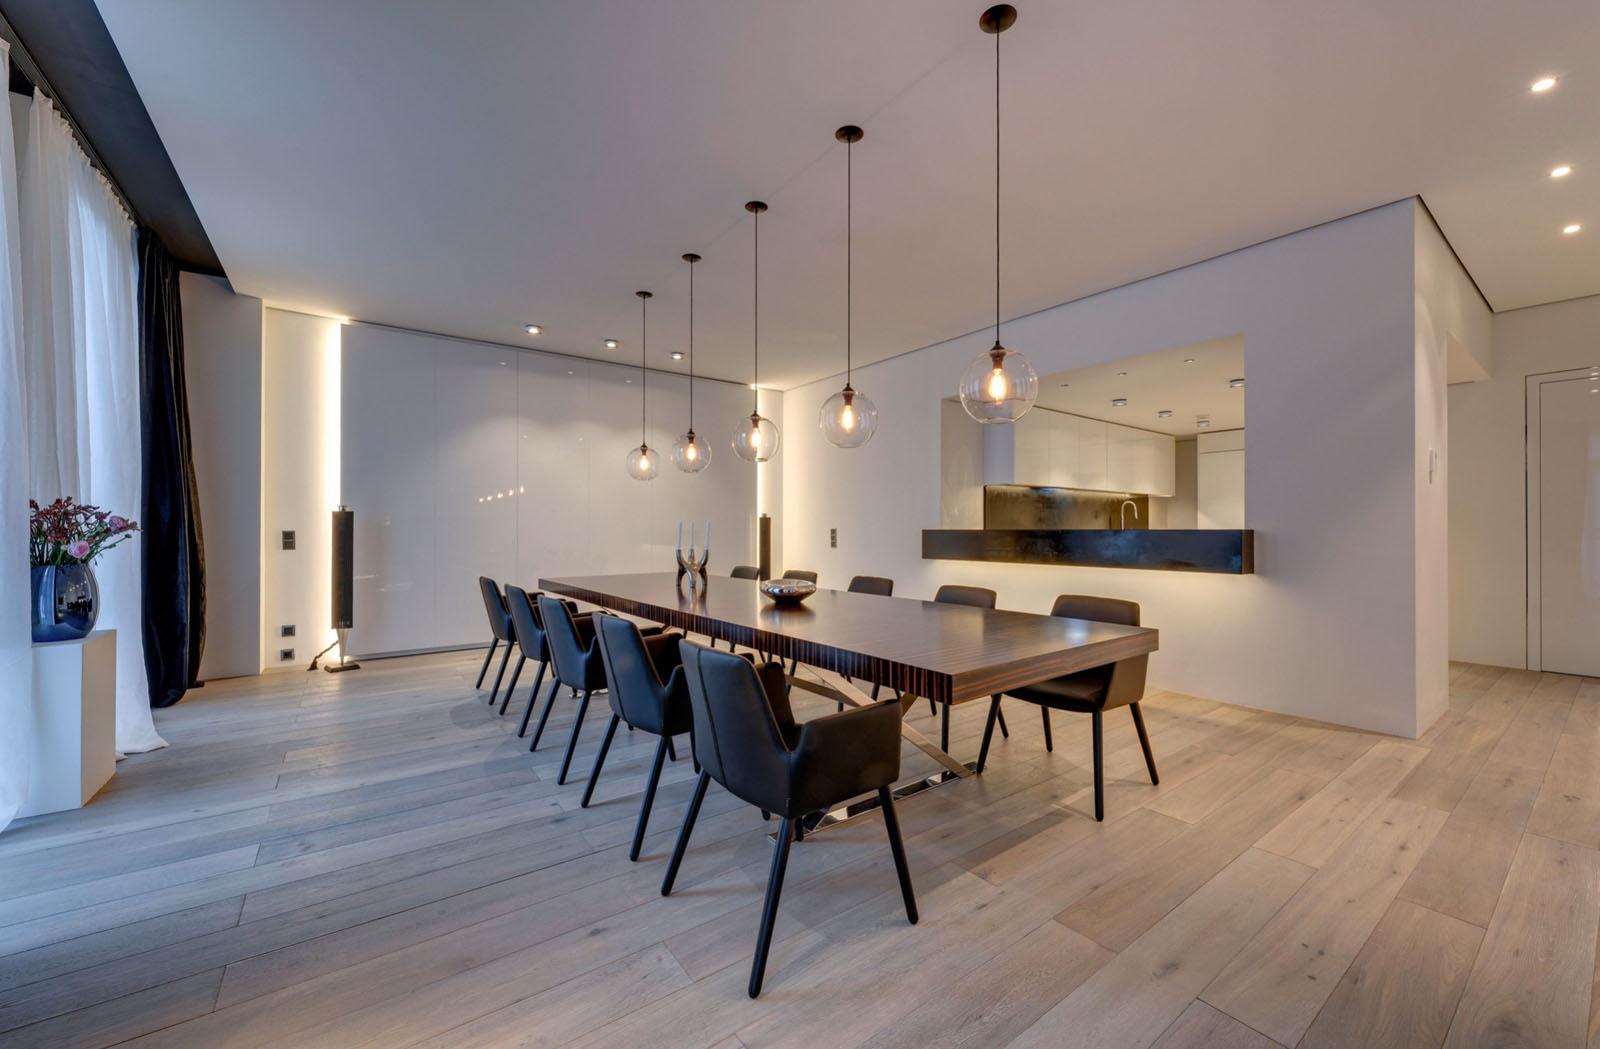 Duplex Apartment In Berlin With Refined Luxury Interior  iDesignArch  Interior Design